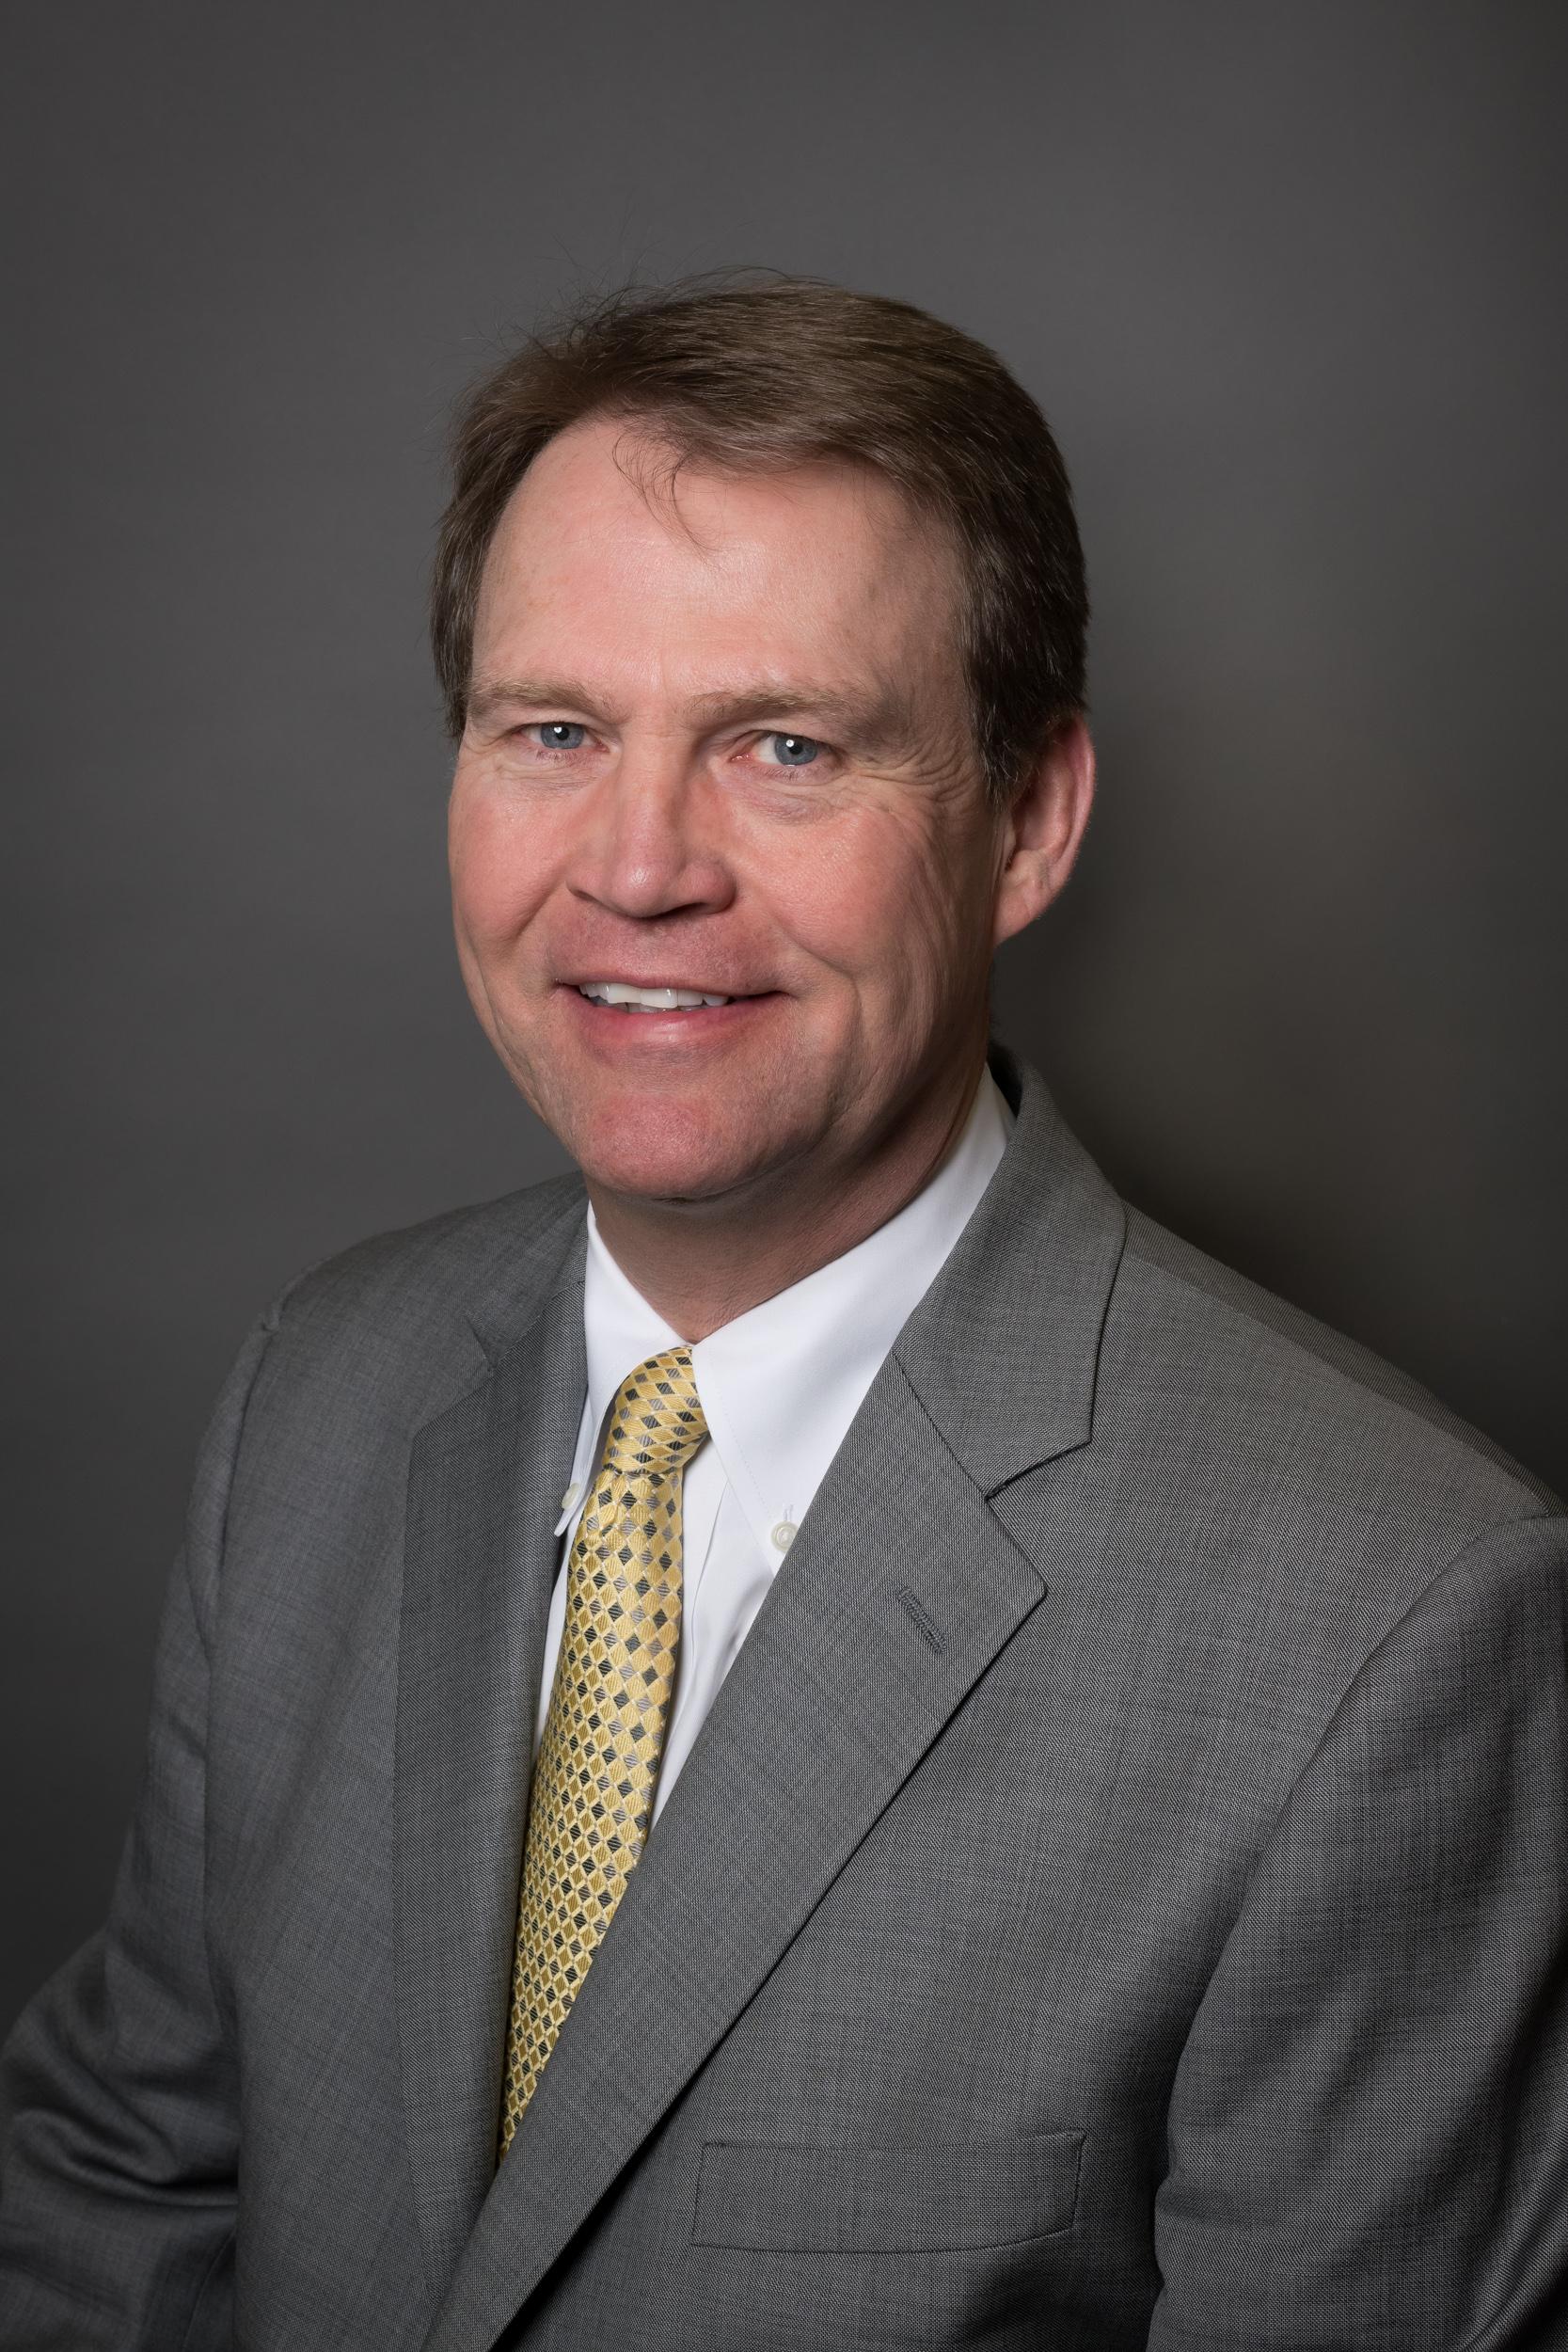 edward Wood - EVP, Chief Lending Officer